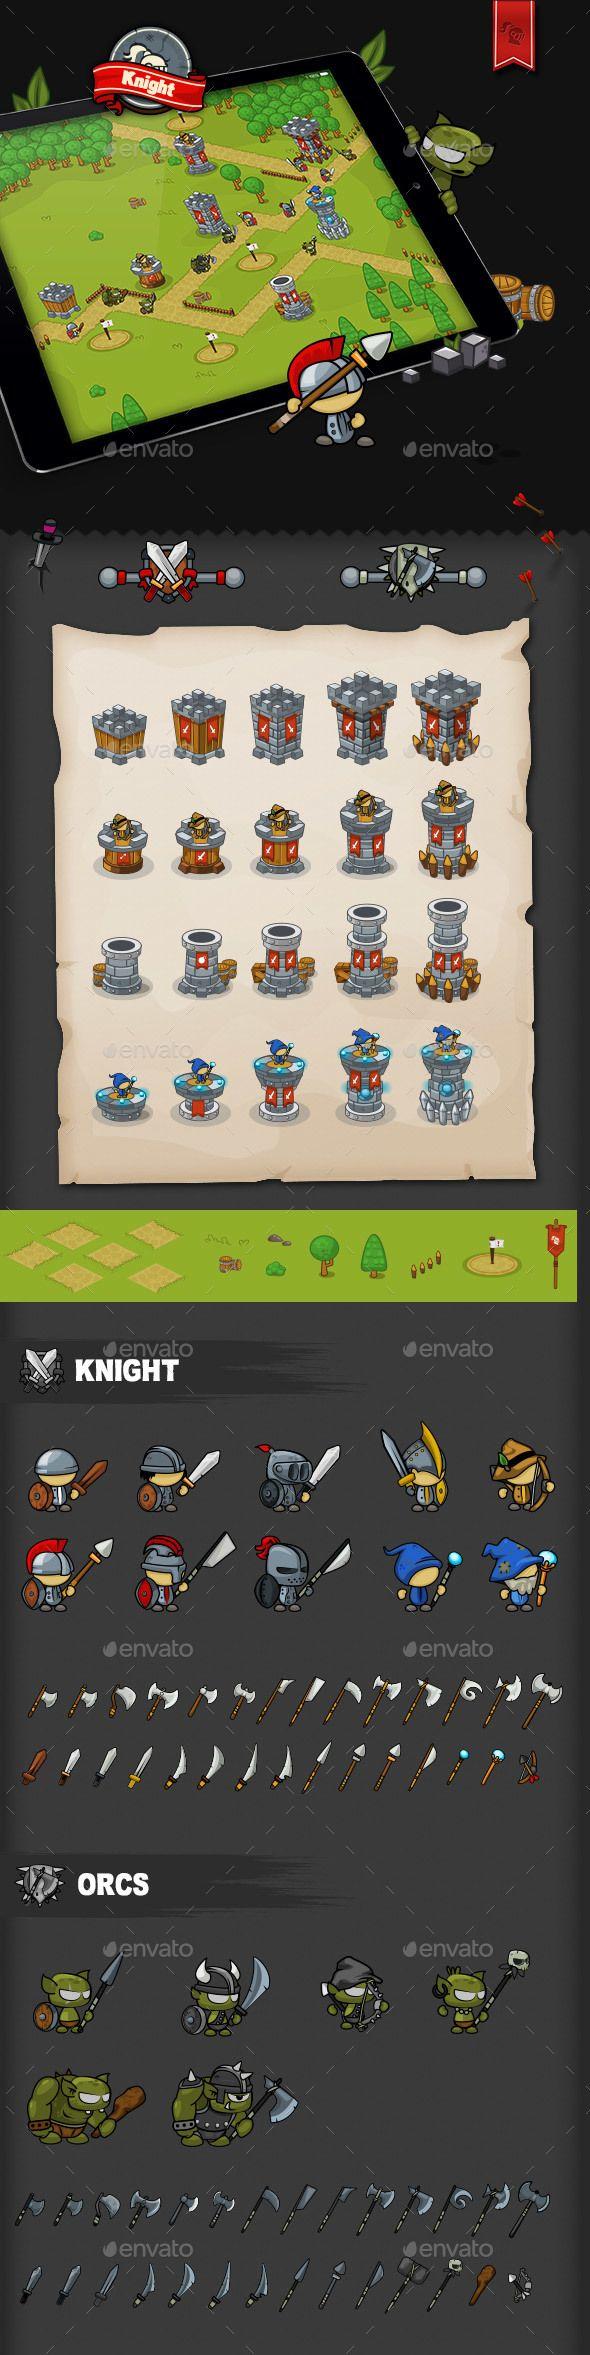 Tower Defense Game Set Knight | DOWNLOAD: https://graphicriver.net/item/tower-defense-game-set-knight/20027353?ref=sinzo #Game Kits Game #Assets